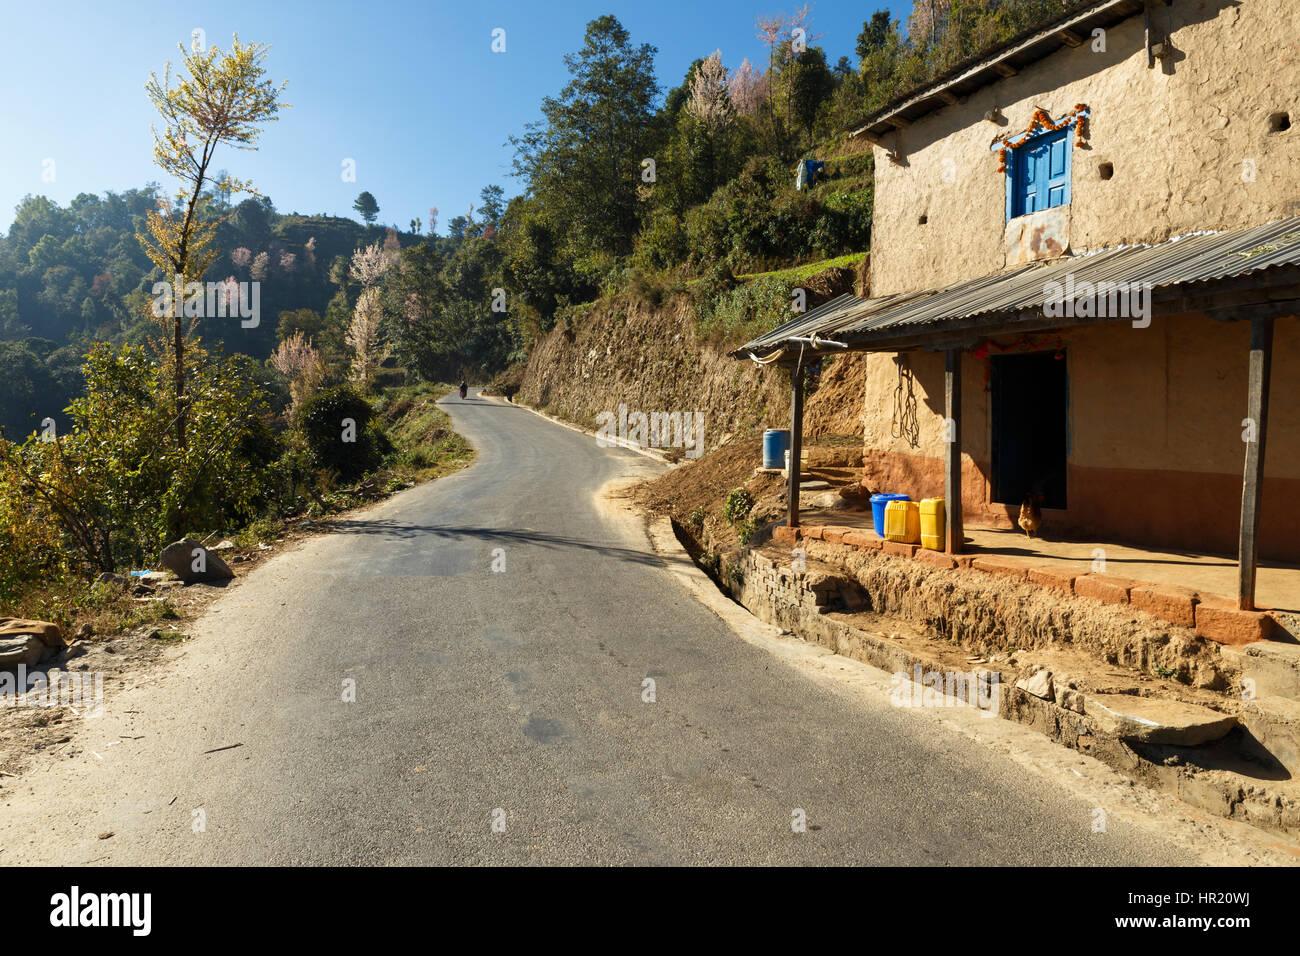 Casa sulla strada di Thrangu Tashi Yangtse monastero - Namo Buddha, Nepal Immagini Stock